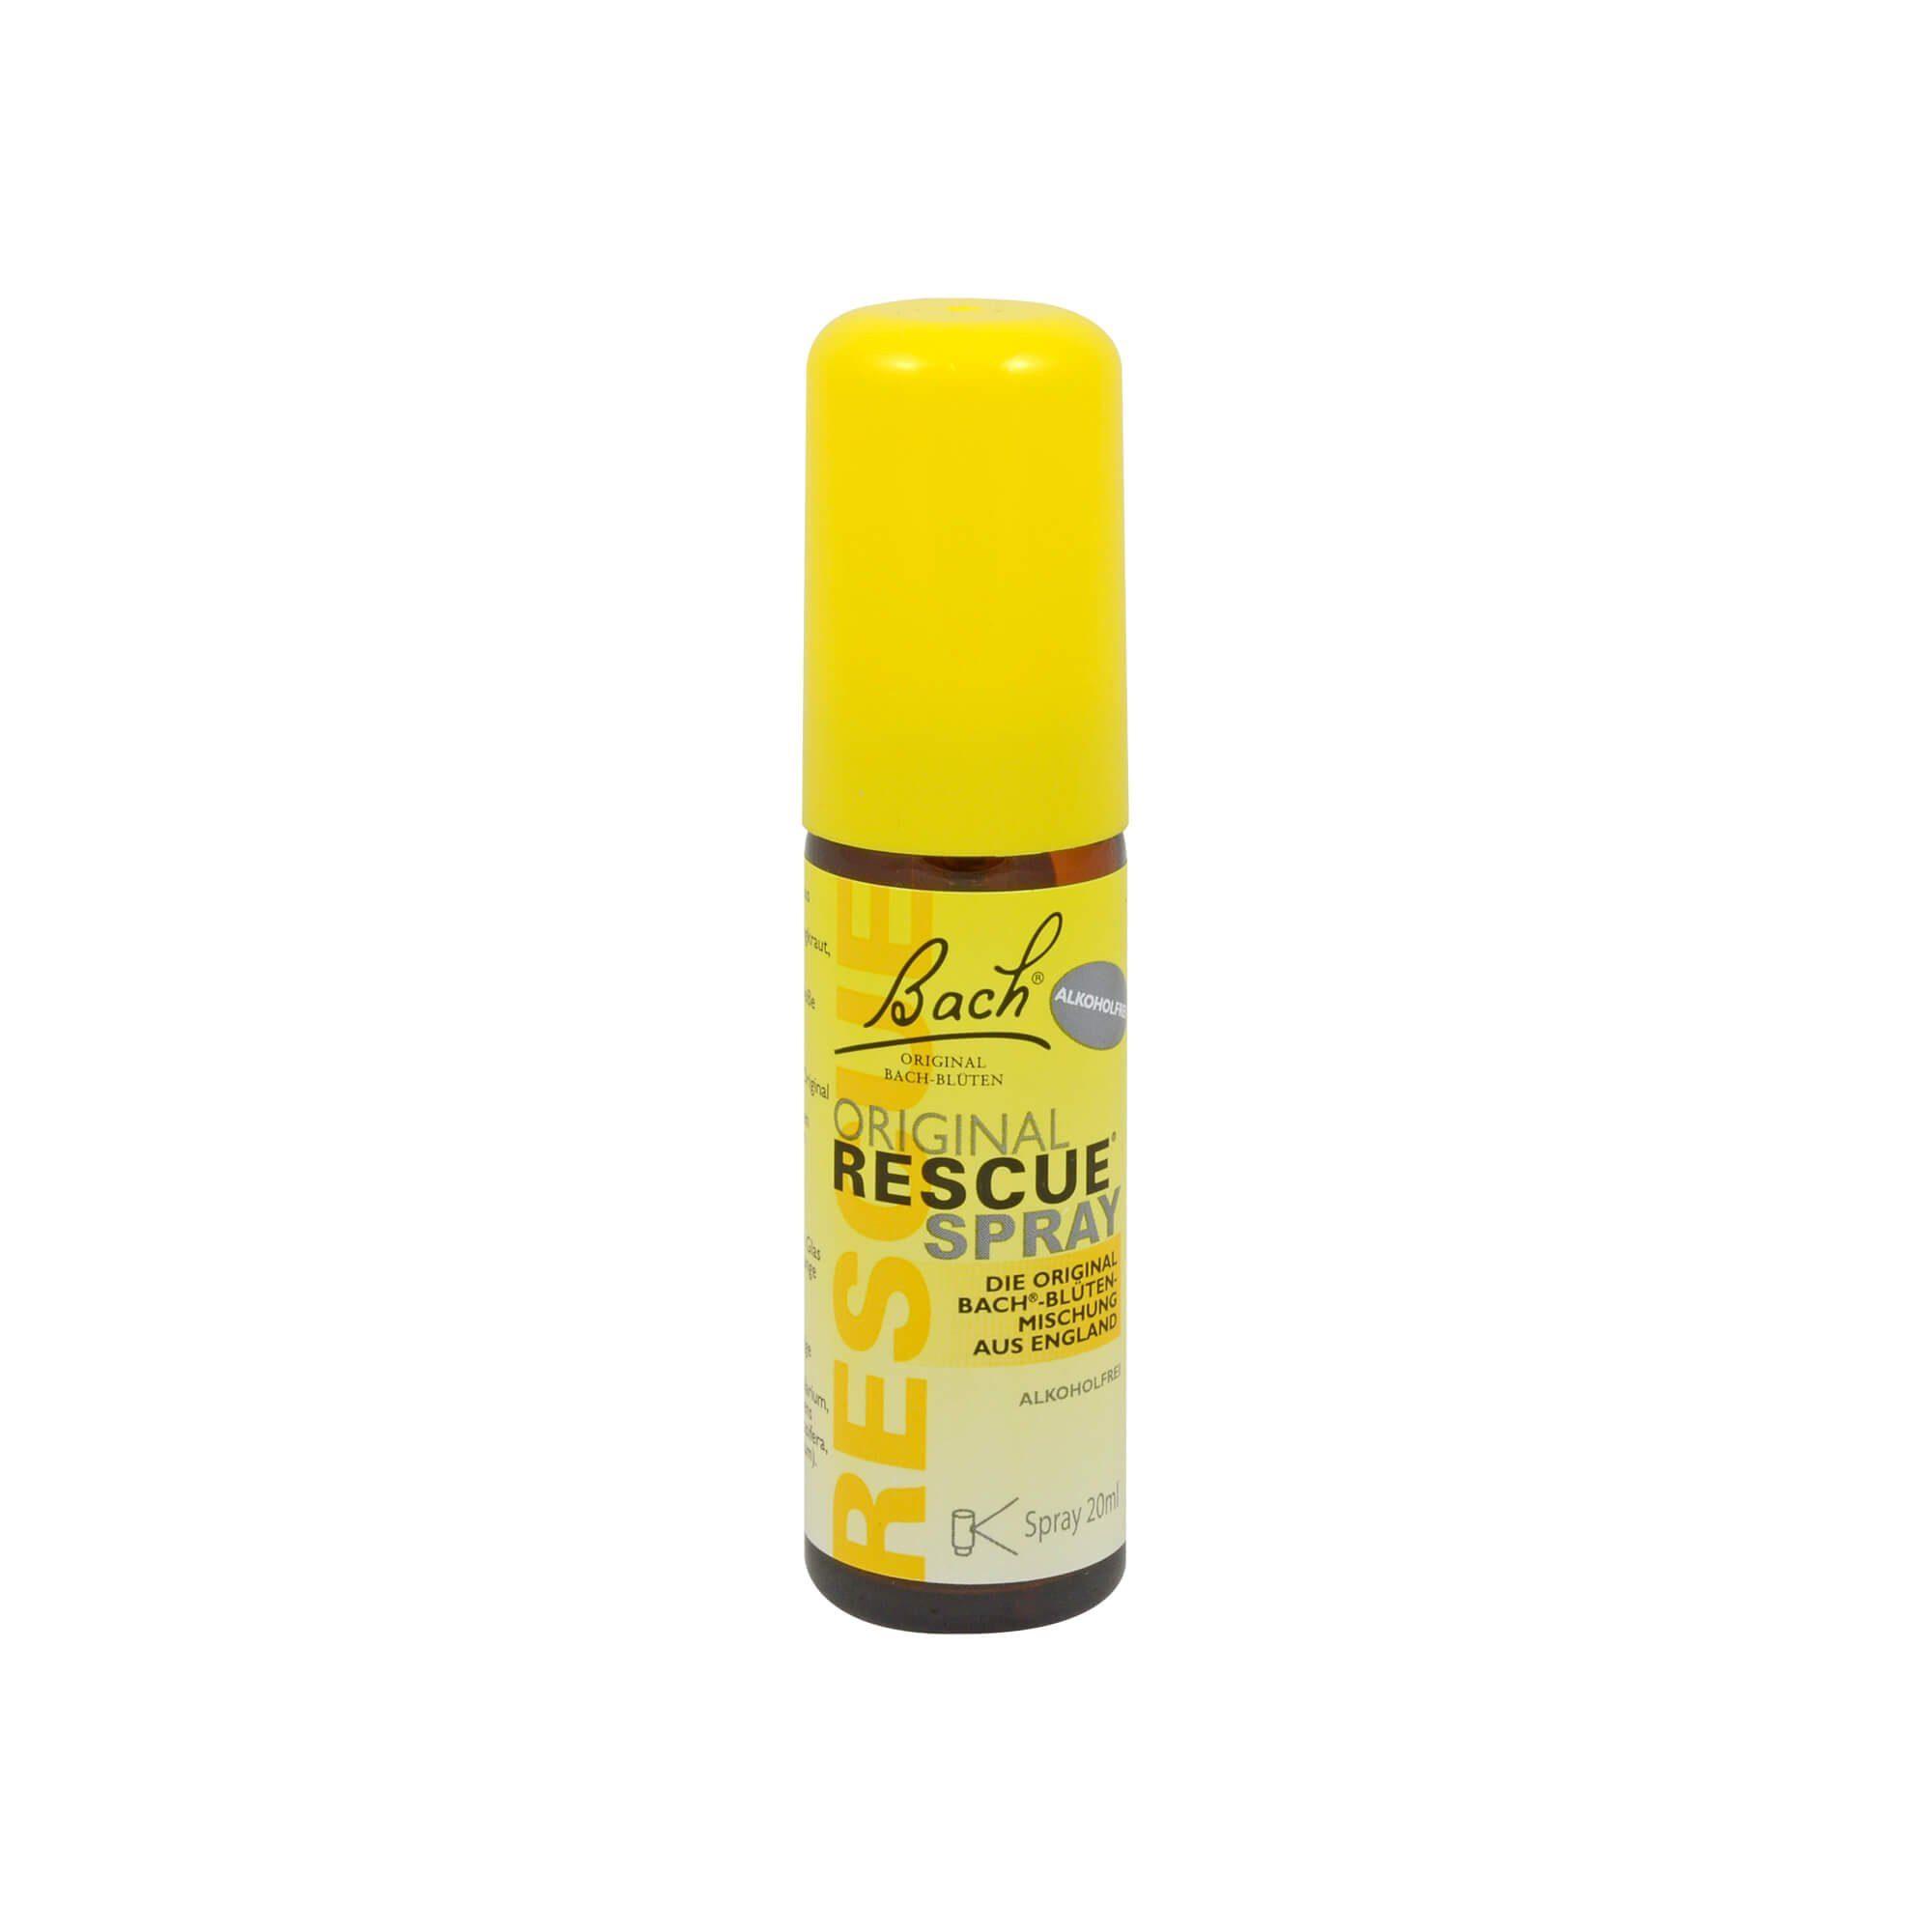 Bach Original Rescue Spray alkoholfrei , 20 ml